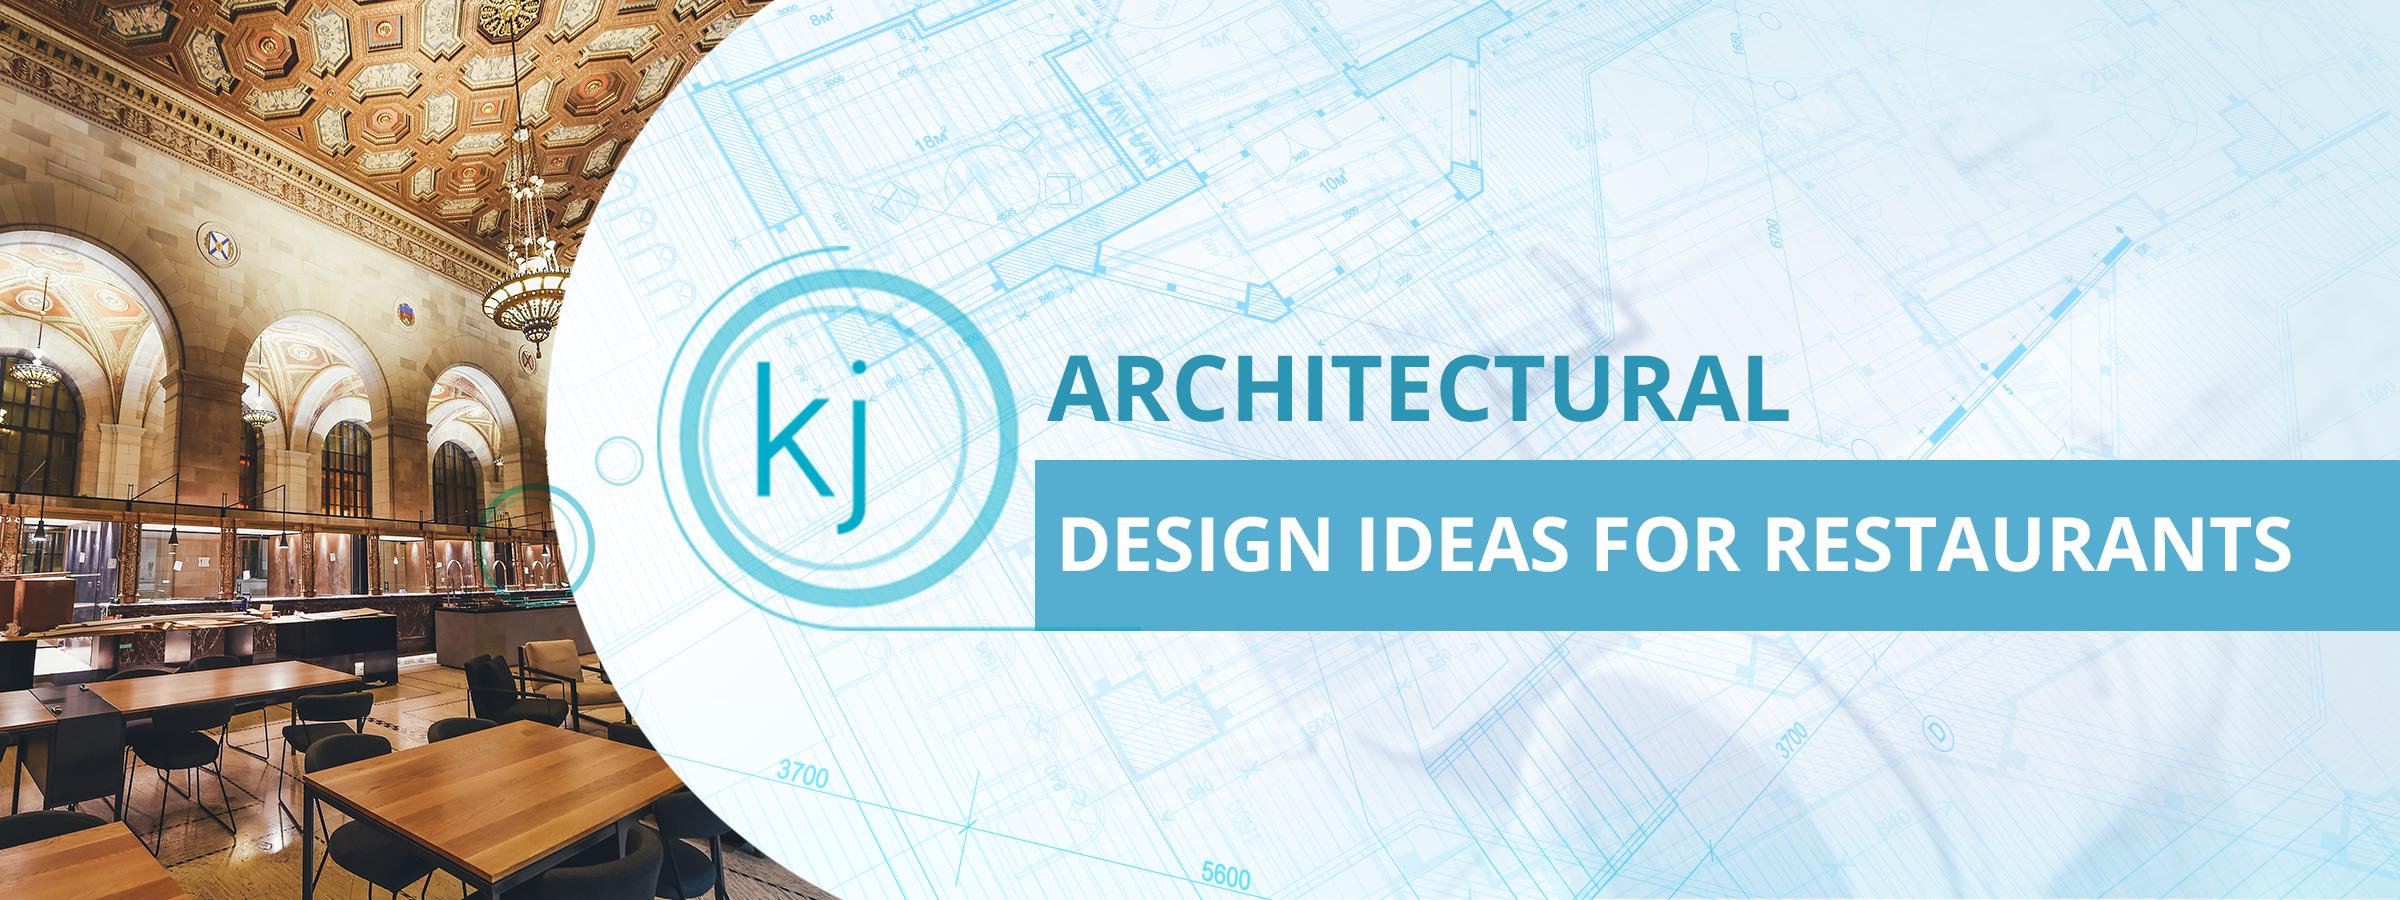 Architectural Design Ideas for Restaurants